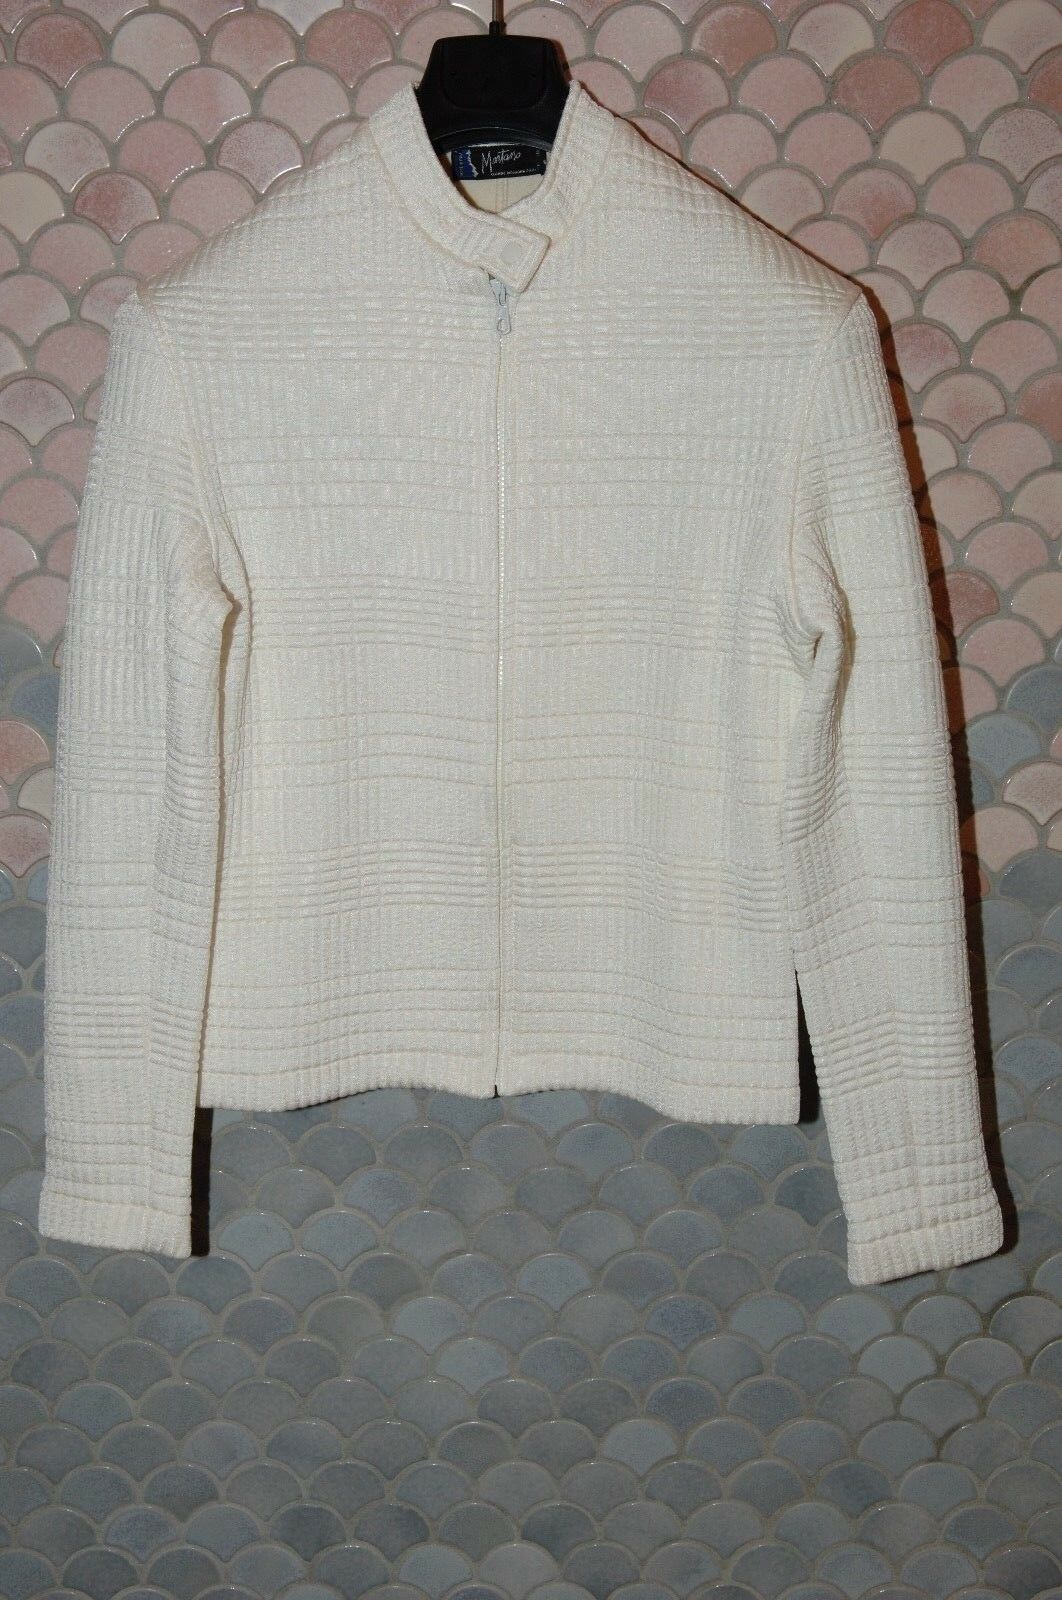 Claude Montana Weiß Cardigan Sweater, Unisex, M, EU 48(50) , Weiß, Nylon/Wool